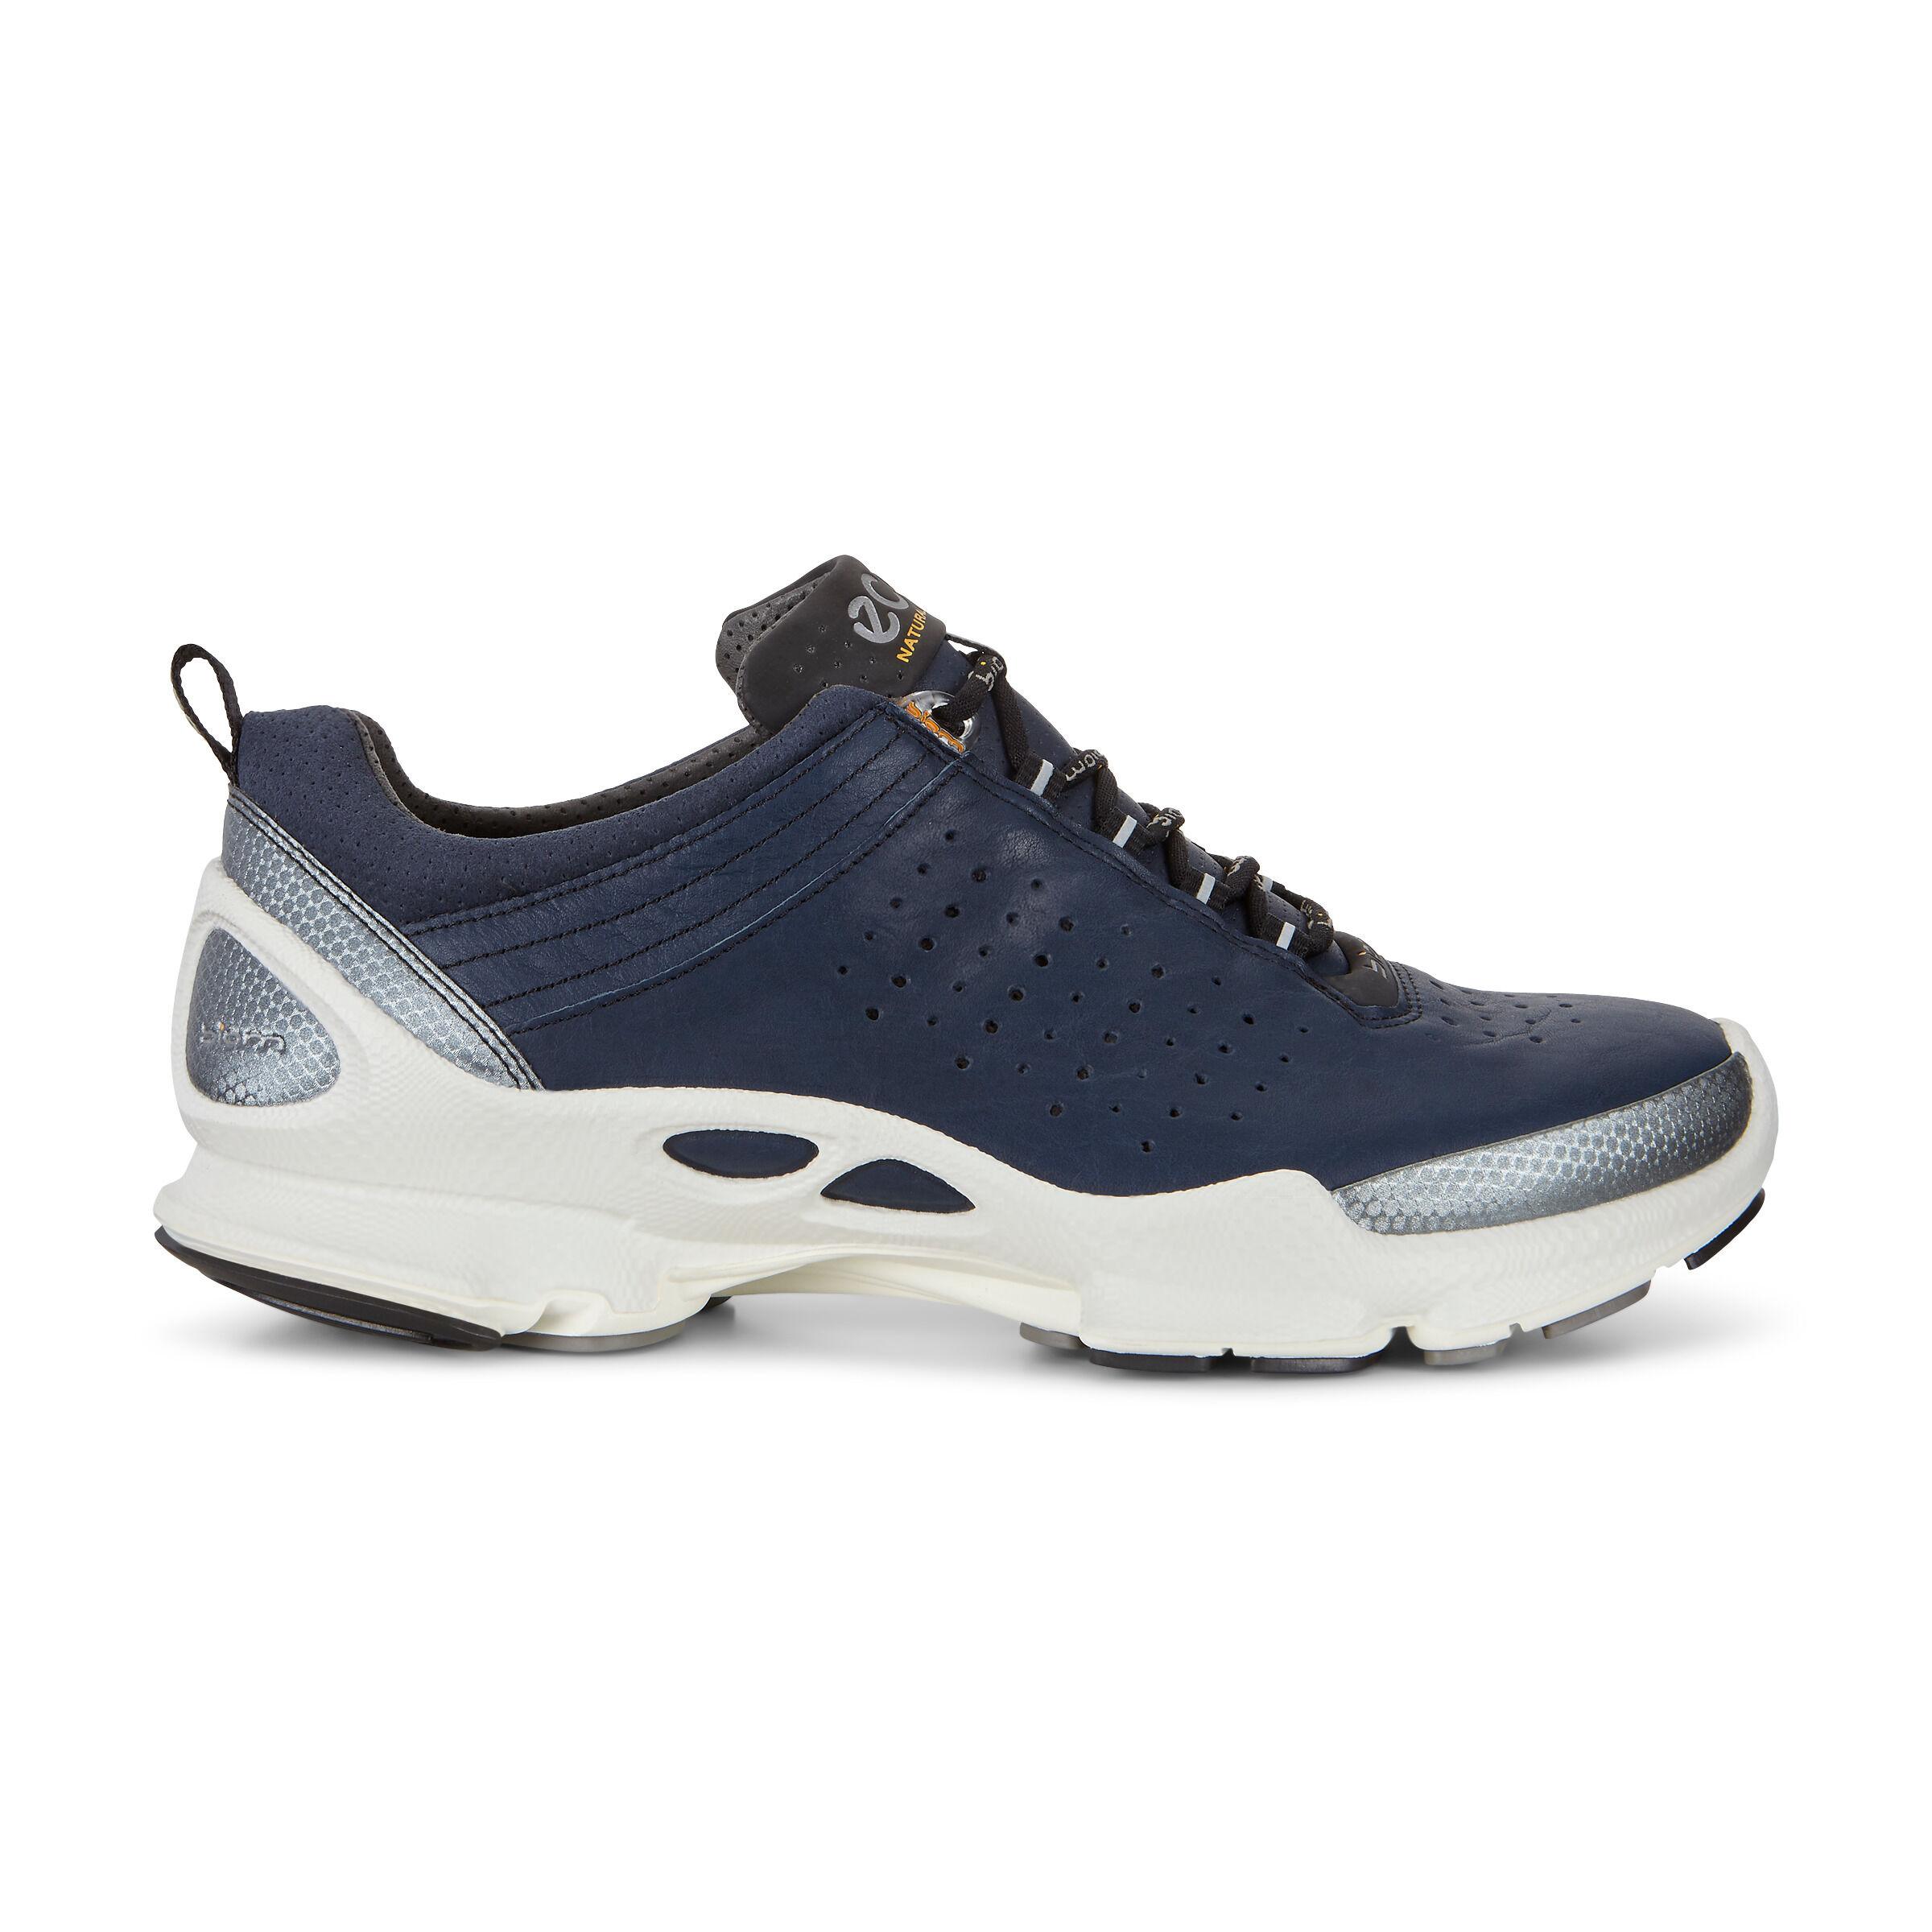 ecco shoes australia